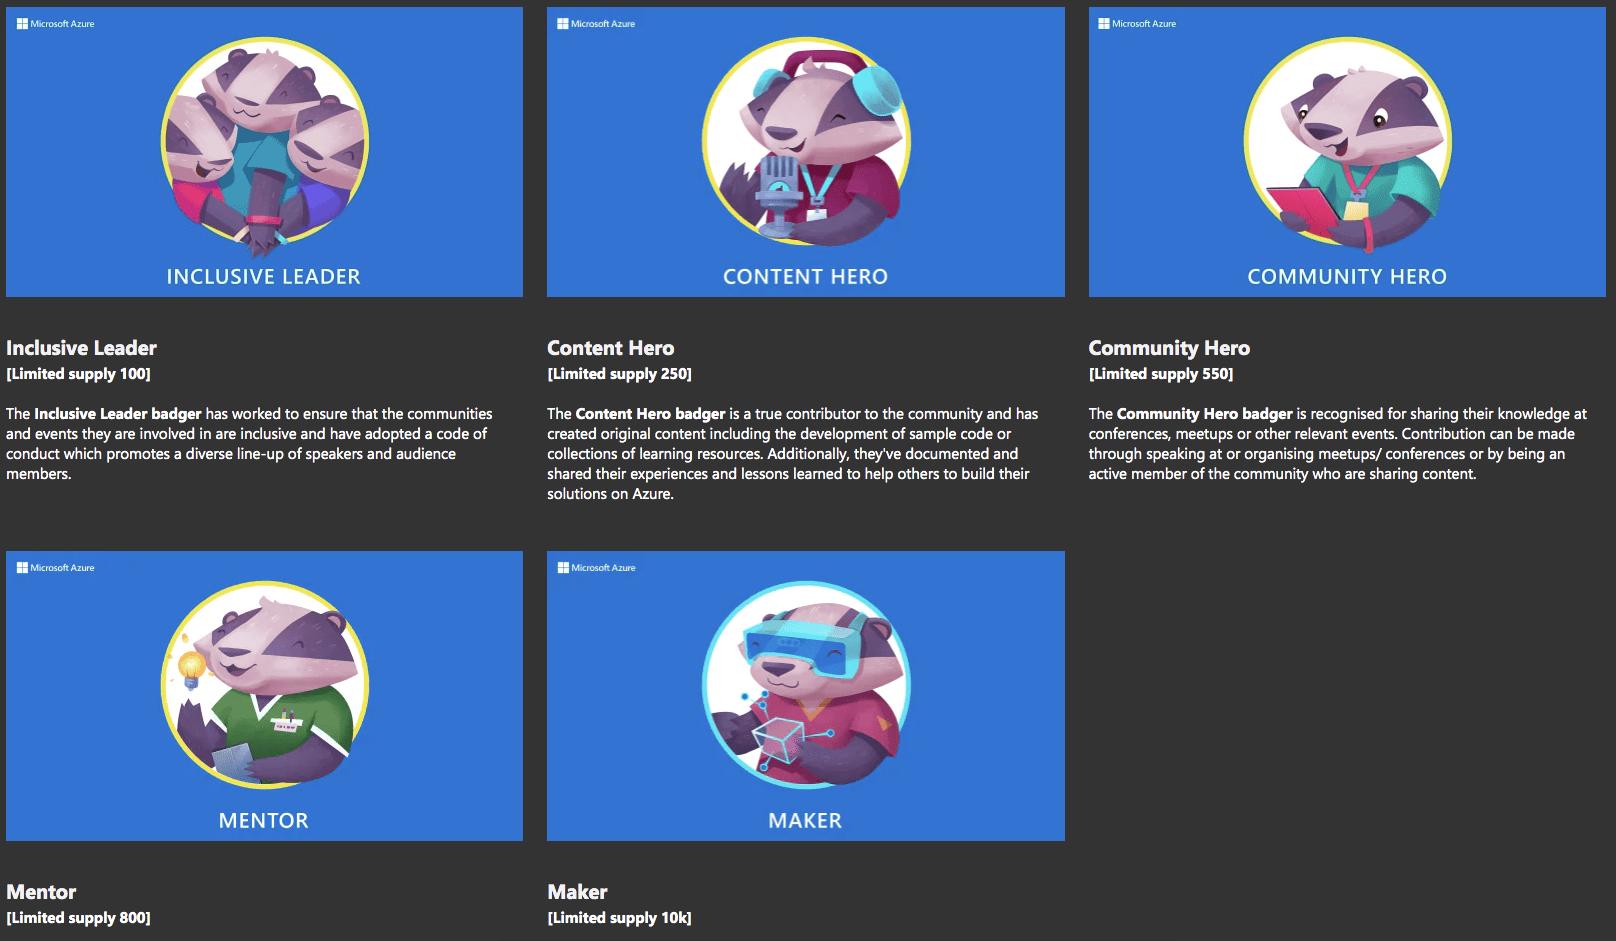 blaireaux Microsoft Azure Heroes Enjin